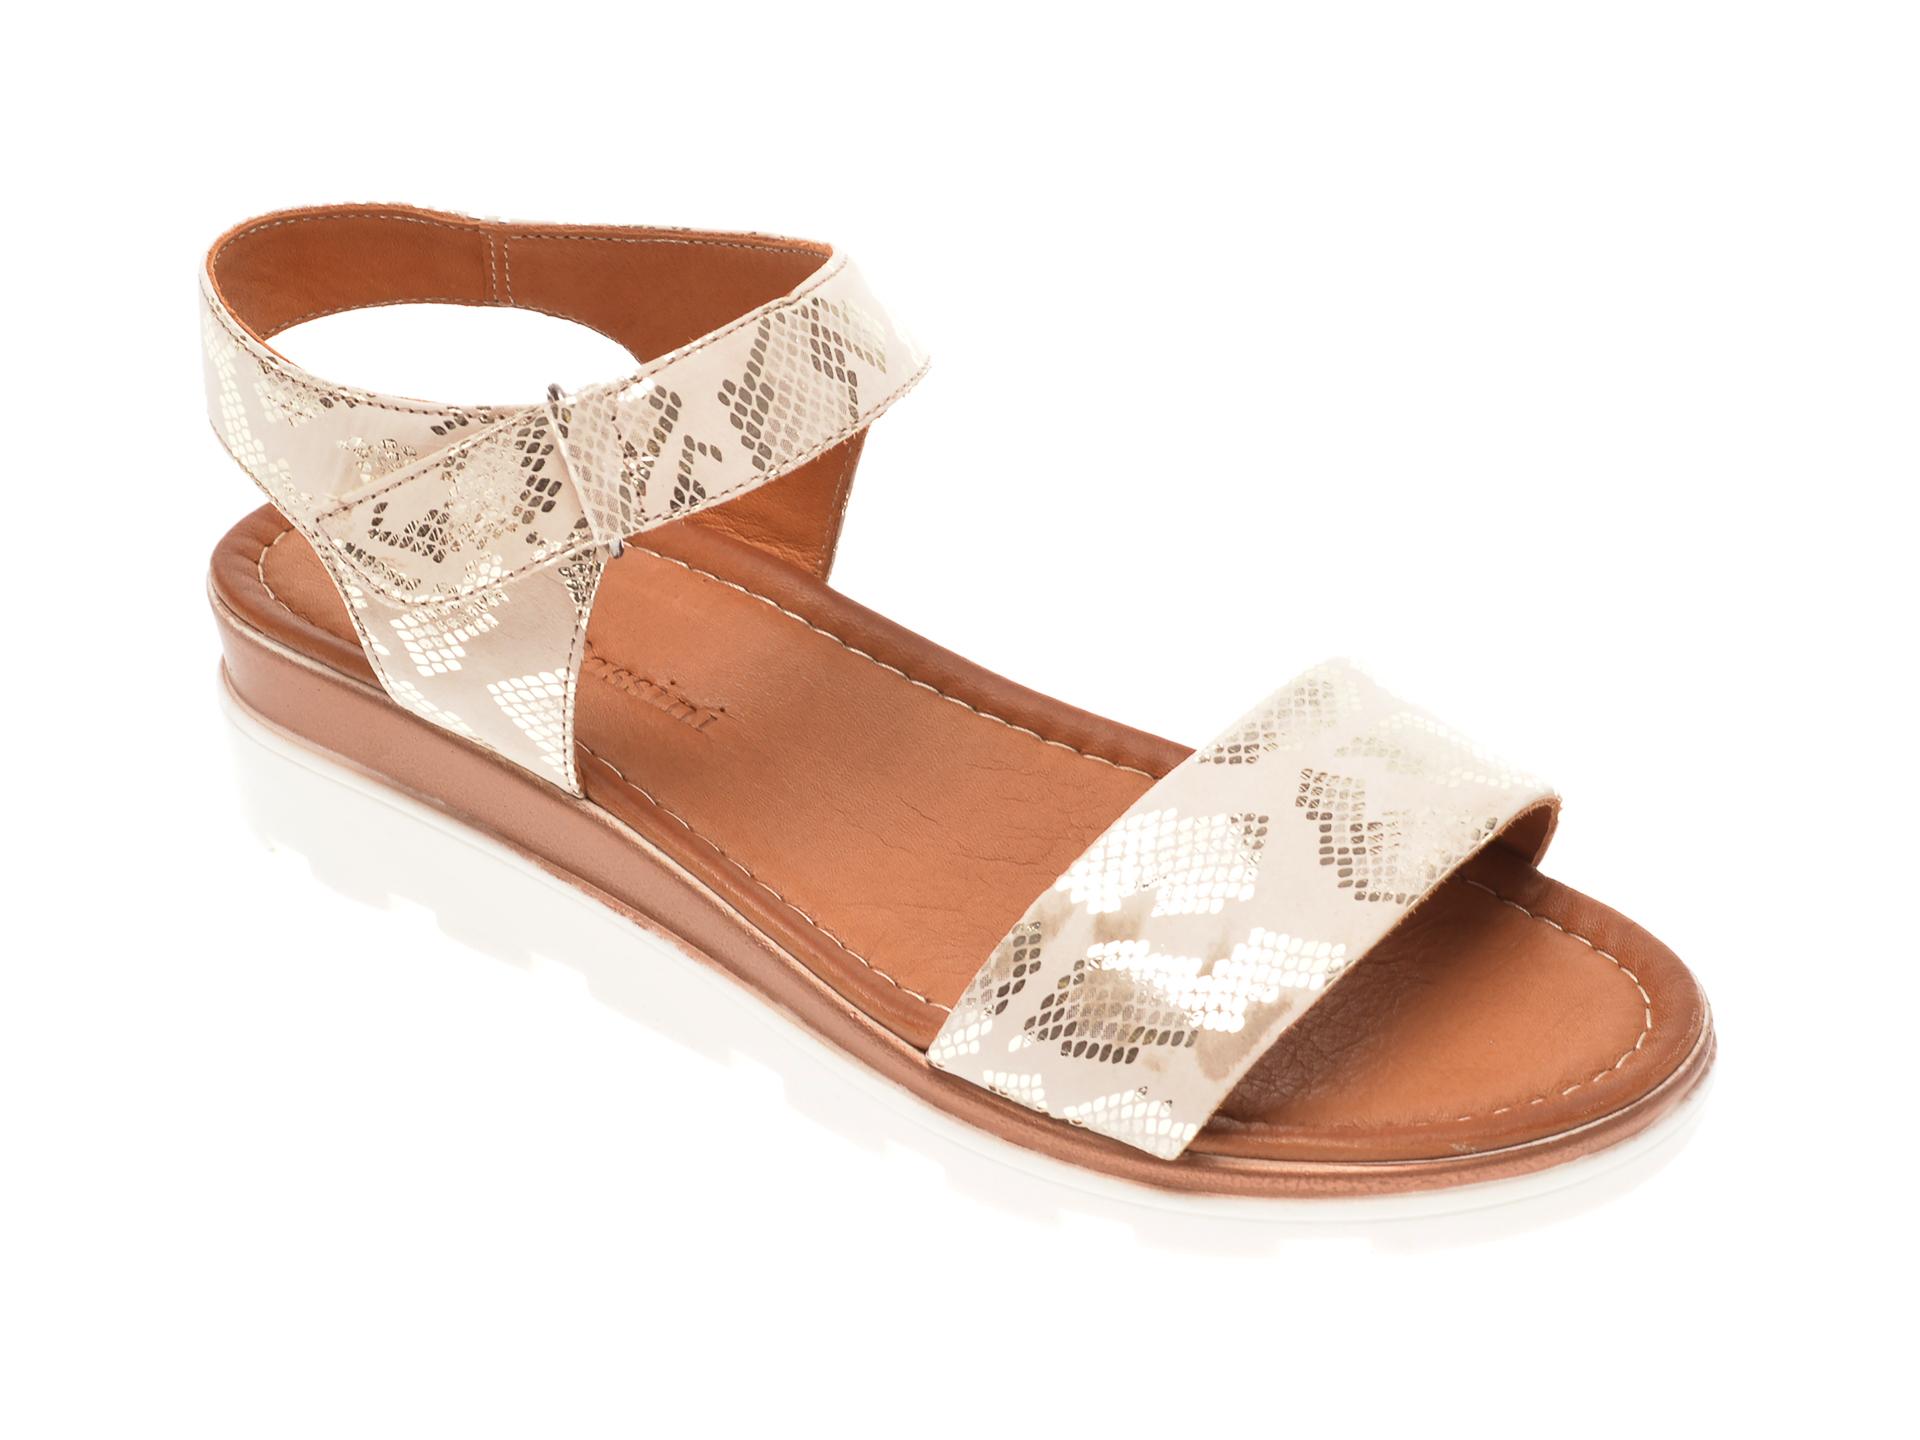 Sandale FLAVIA PASSINI bej, 1182728, din piele naturala New